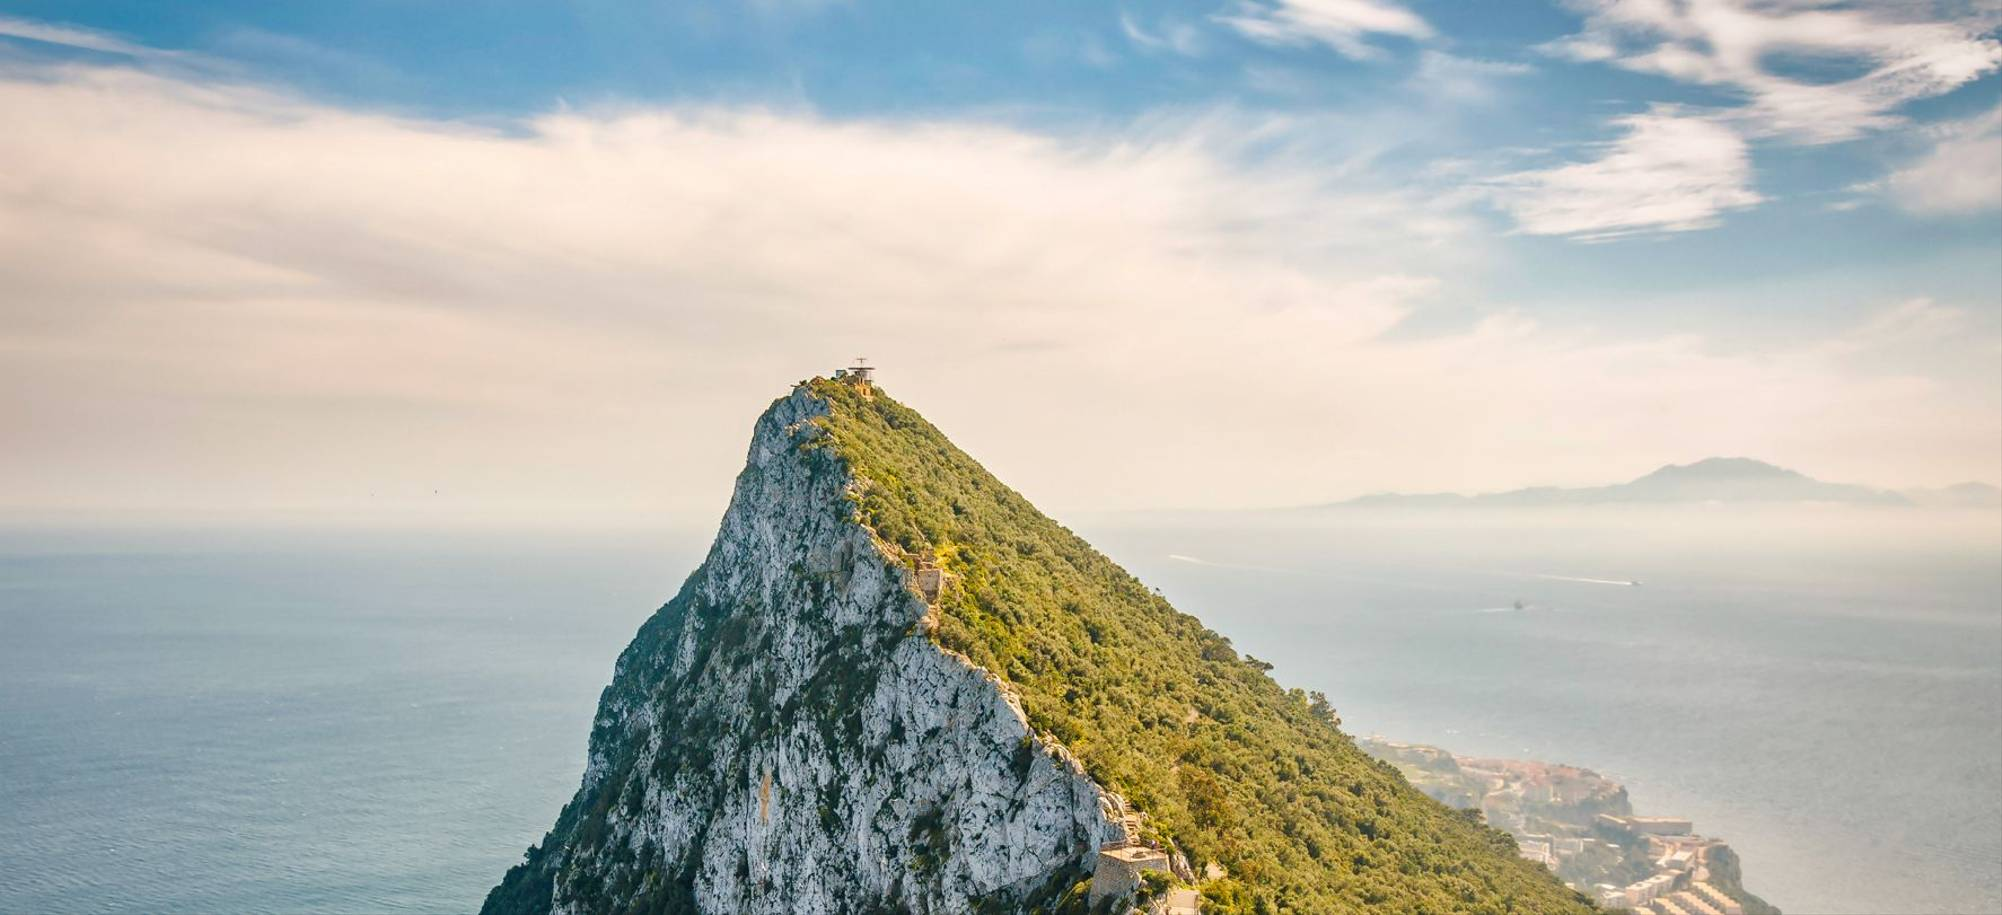 Gibraltar - Rock of Gibraltar - Itinerary Desktop.jpg